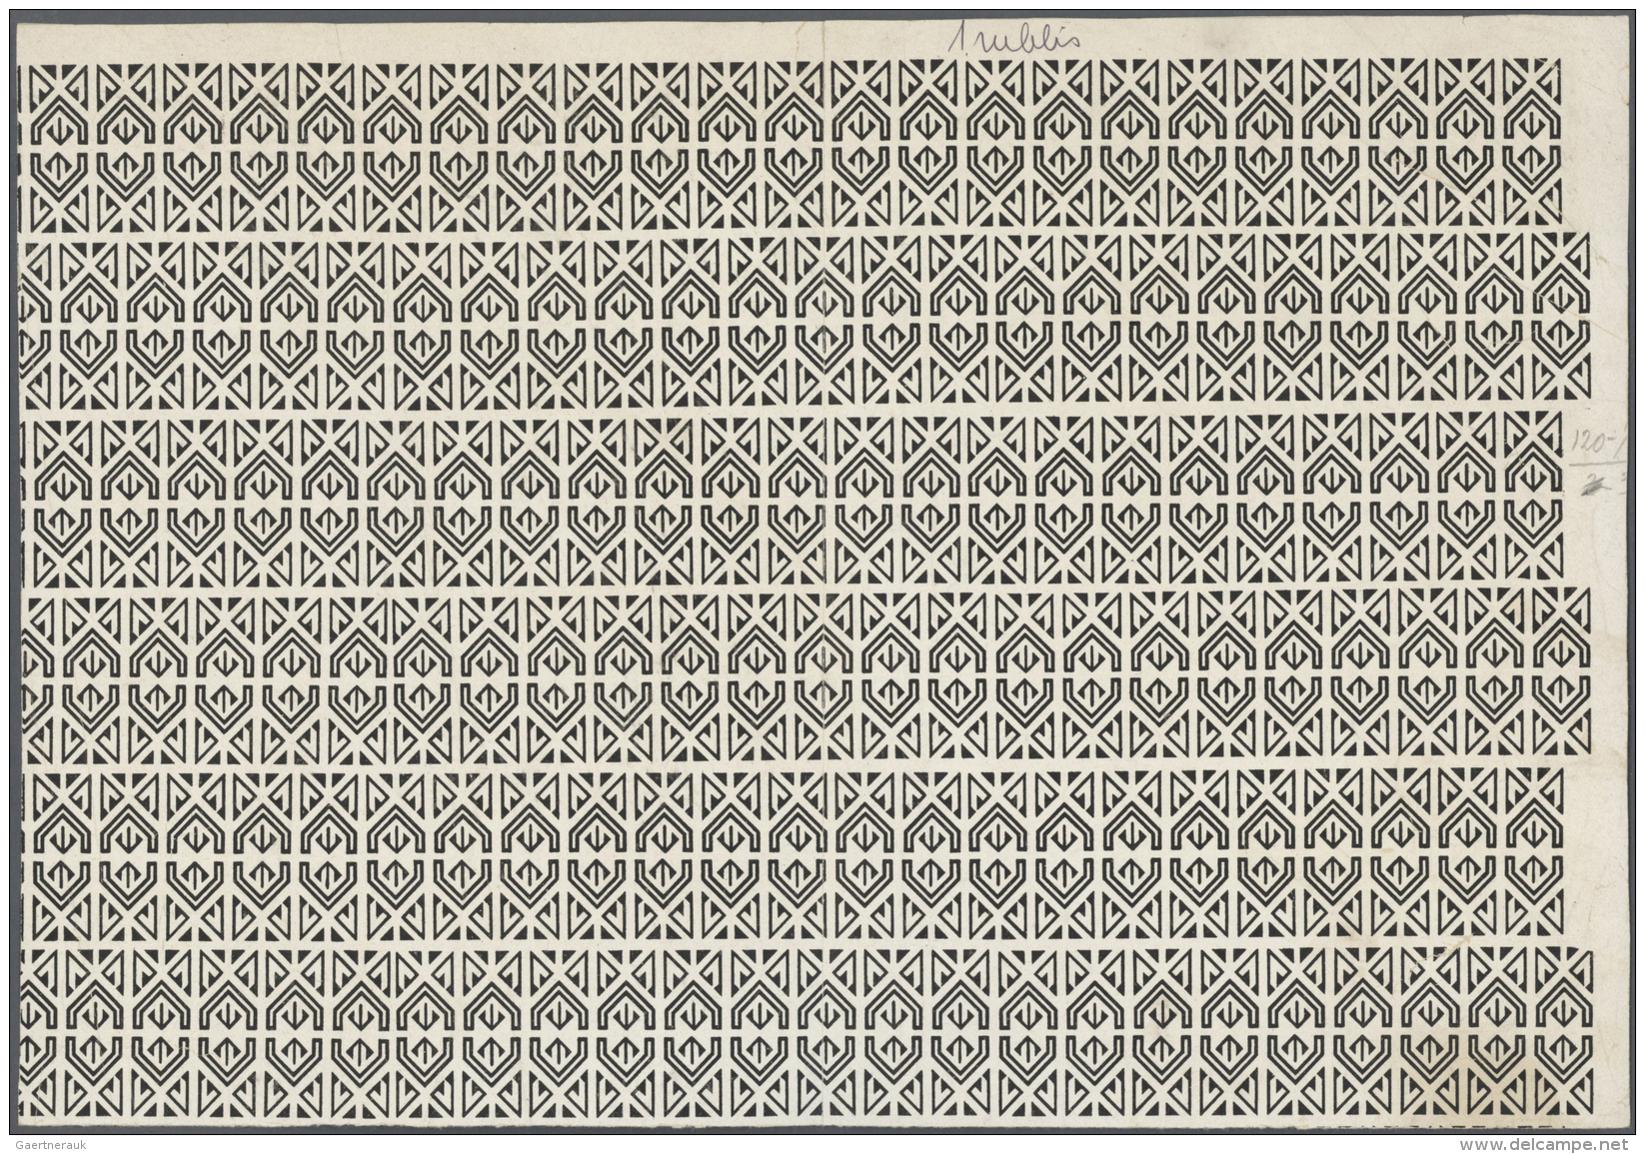 Latvia /Lettland: Rare Large Size Underprint Proof Of 1 Rublis 1919 P. 1p, Size 290mm X 200mm, Uniface Print, Center Fol - Latvia